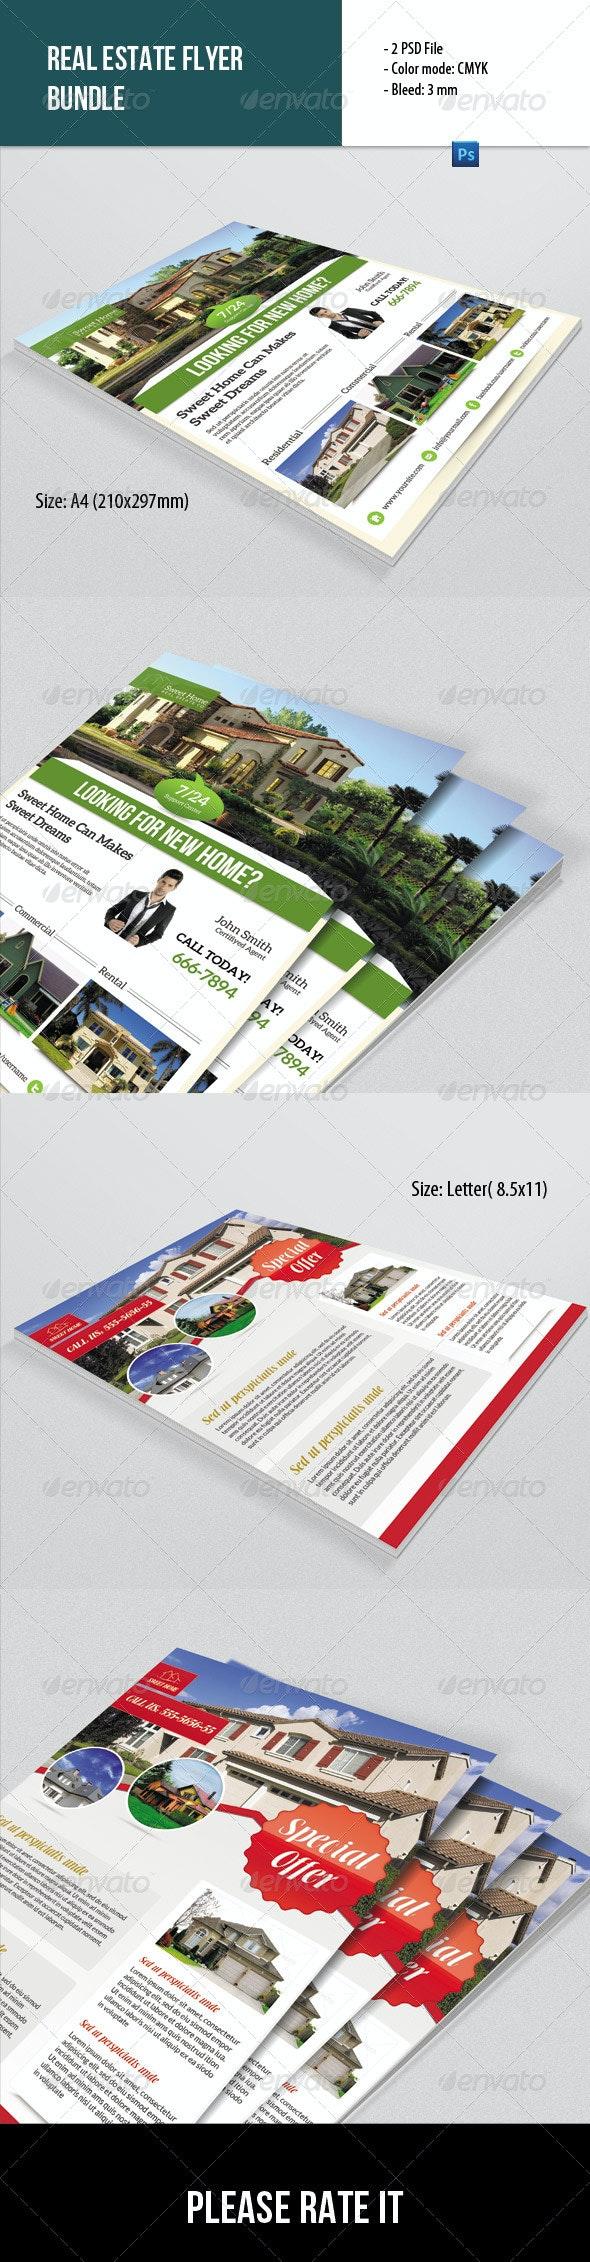 2 Real Estate Flyer Bundle - Corporate Flyers